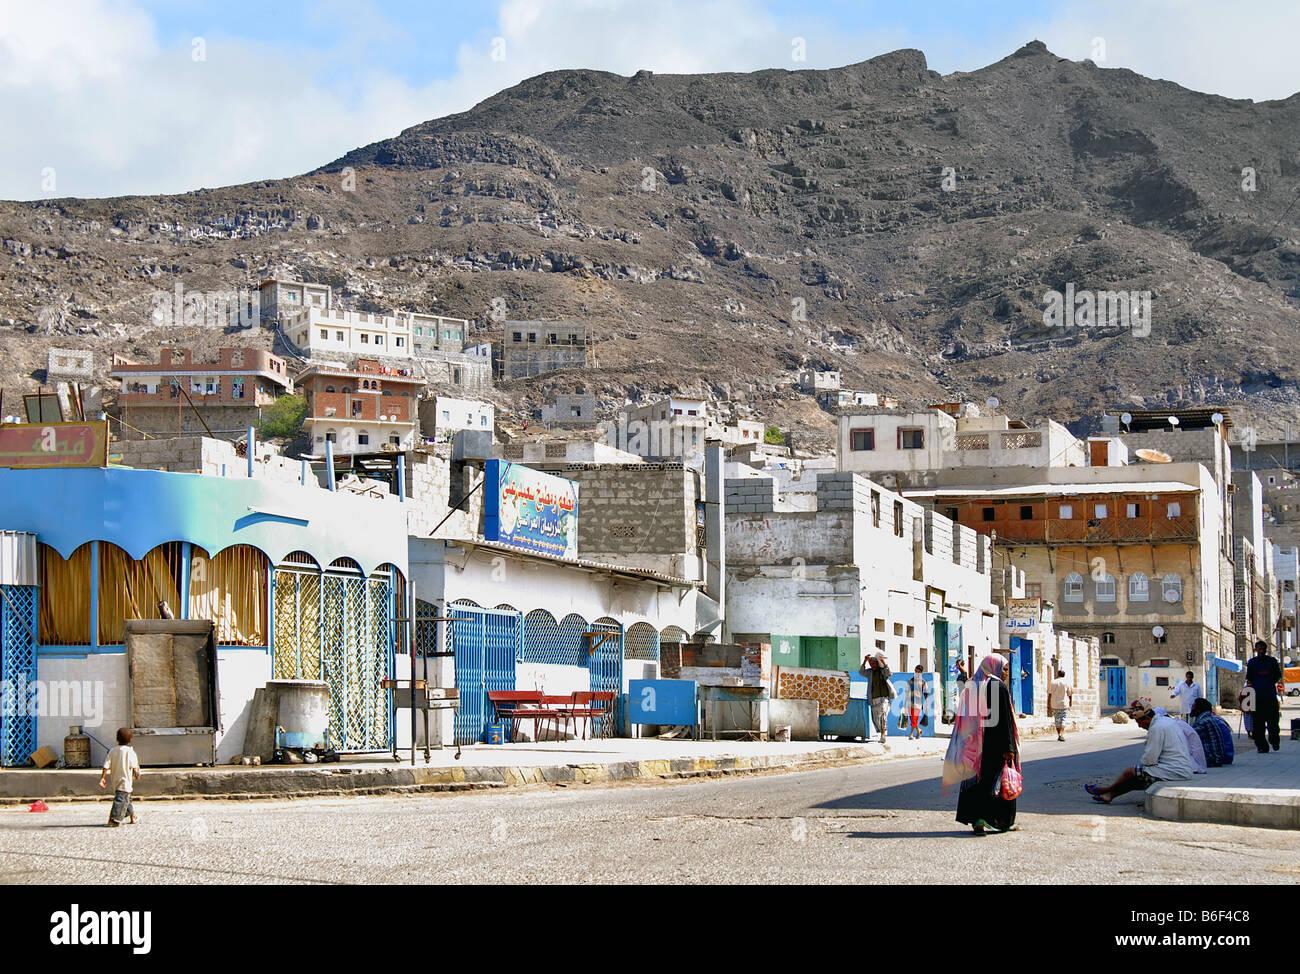 typical street scene in the traditional Arabian city of Aden, Yemen, Aden - Stock Image